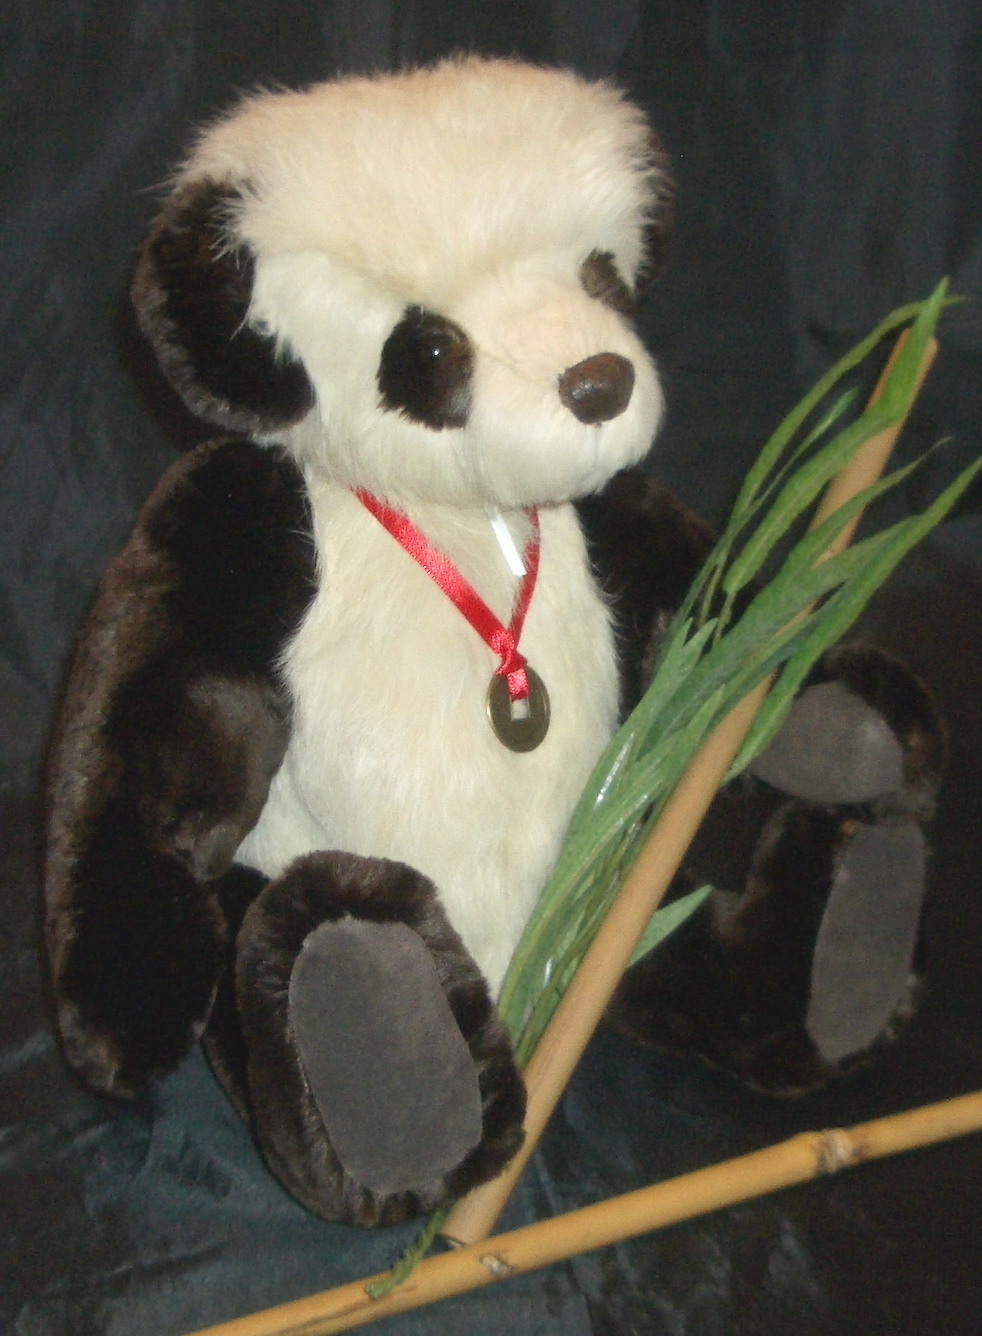 Jane woodard 39 s heir bears handmade heirloom teddy bears for Andy panda jardin